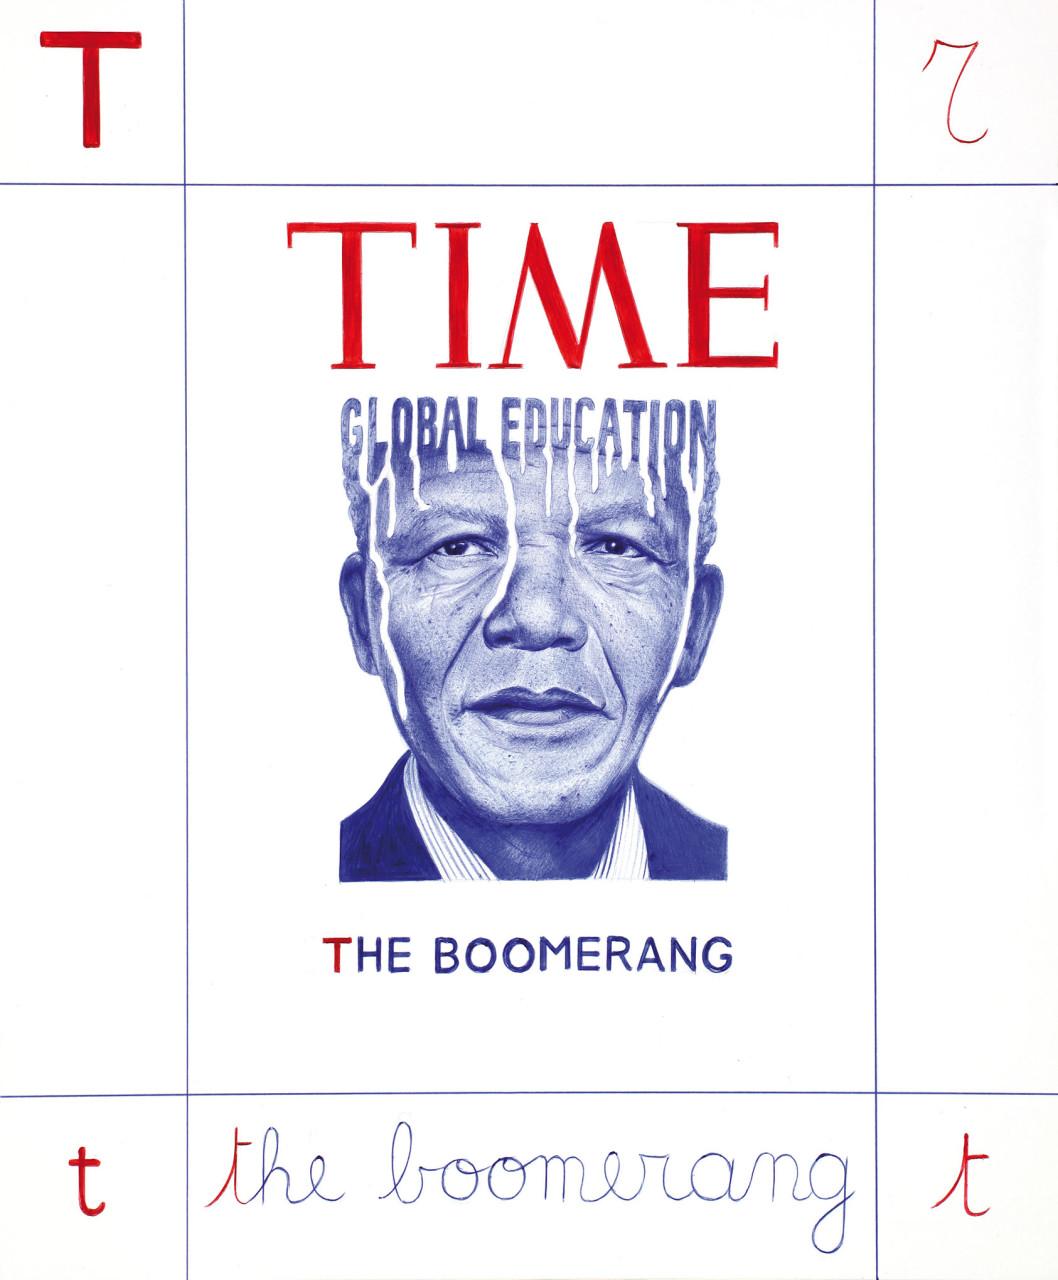 05T-the boomerang_bassa